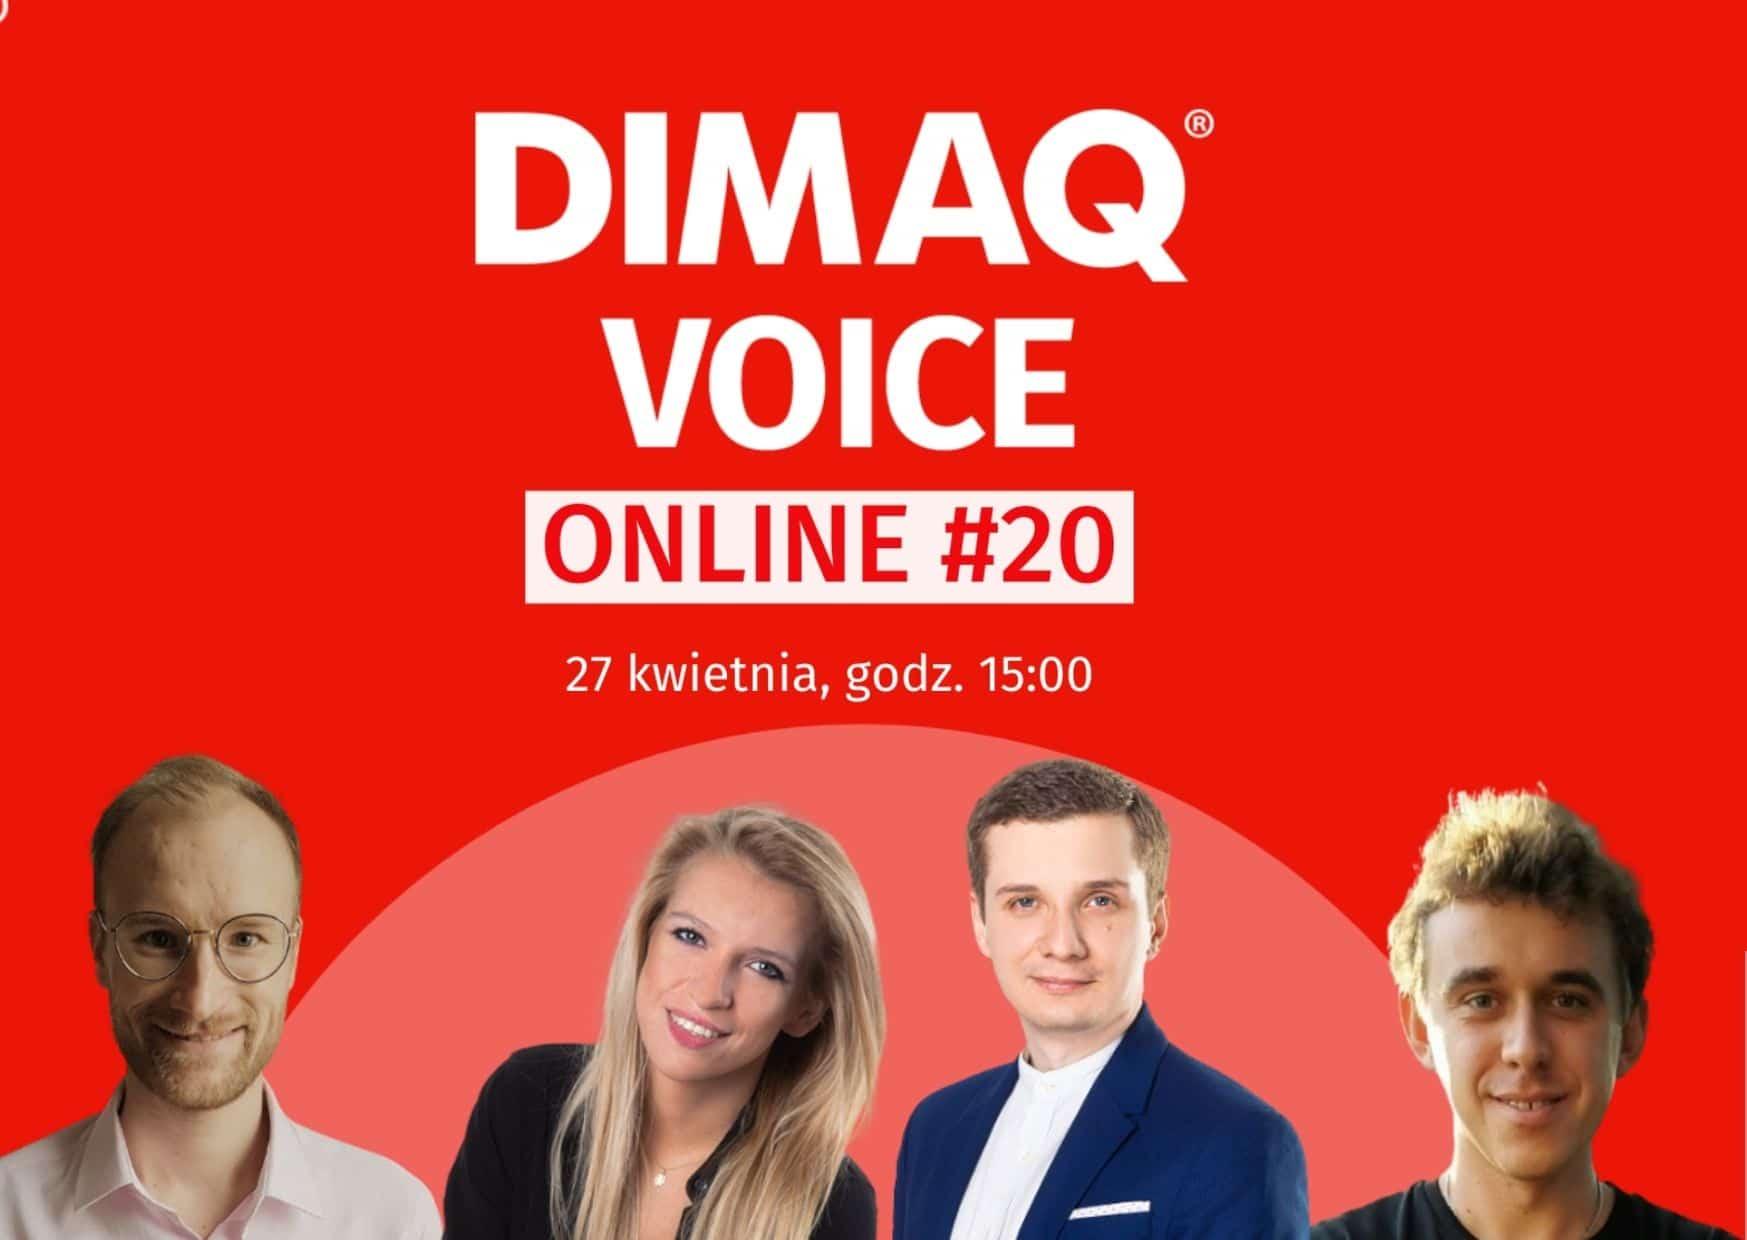 #20 DIMAQ Voice